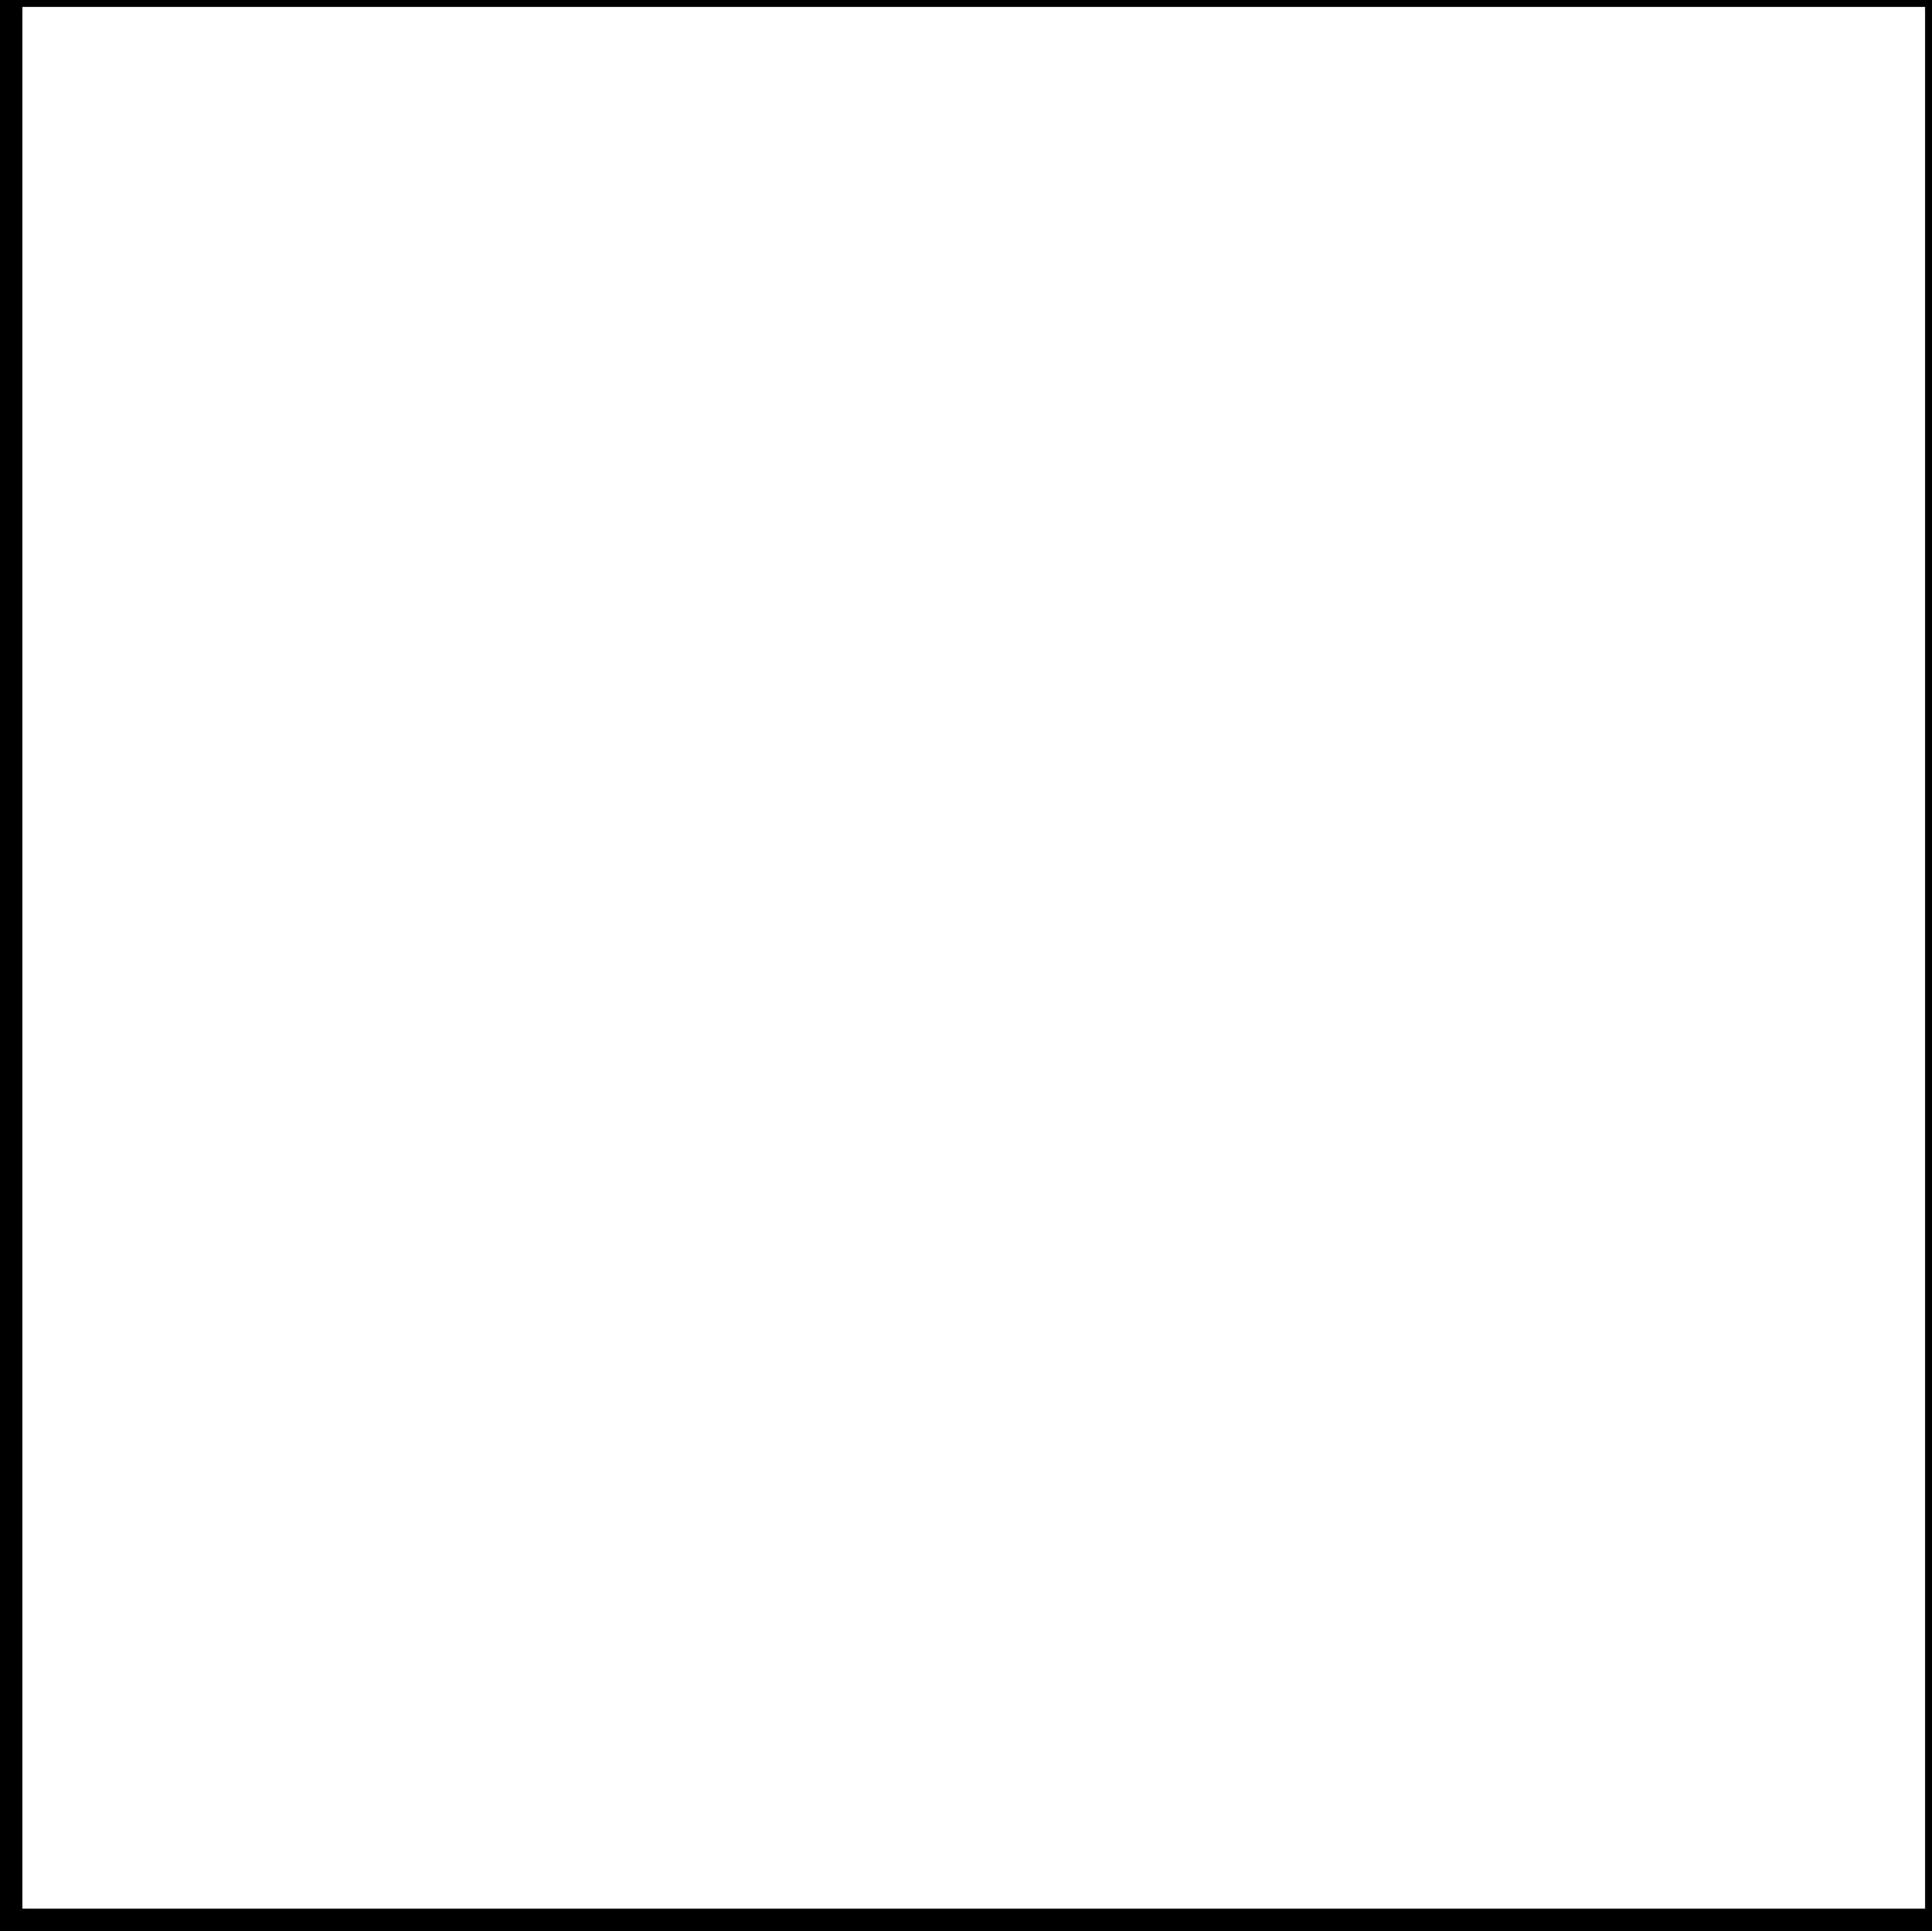 Mantel BLANCO Rectangular 1,2x1,7m [retirooenvíoen 5·7díashábiles]